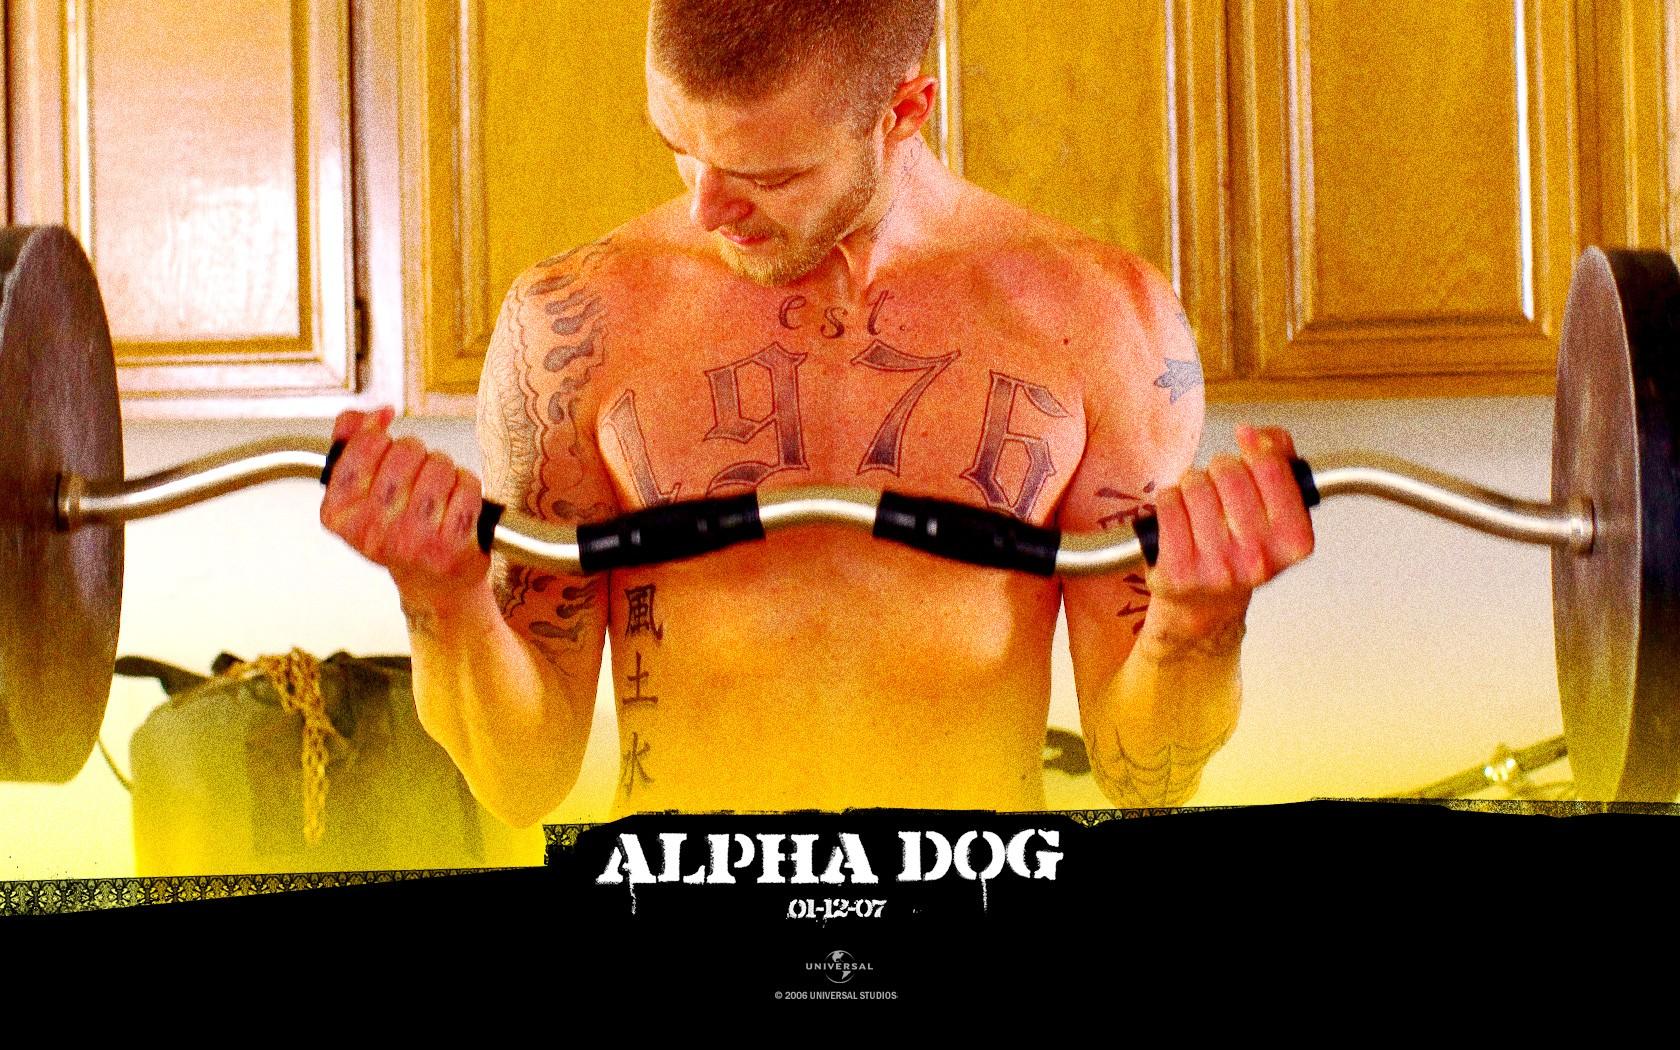 Un wallpaper di Justin Timberlake nel film 'Alpha Dog'